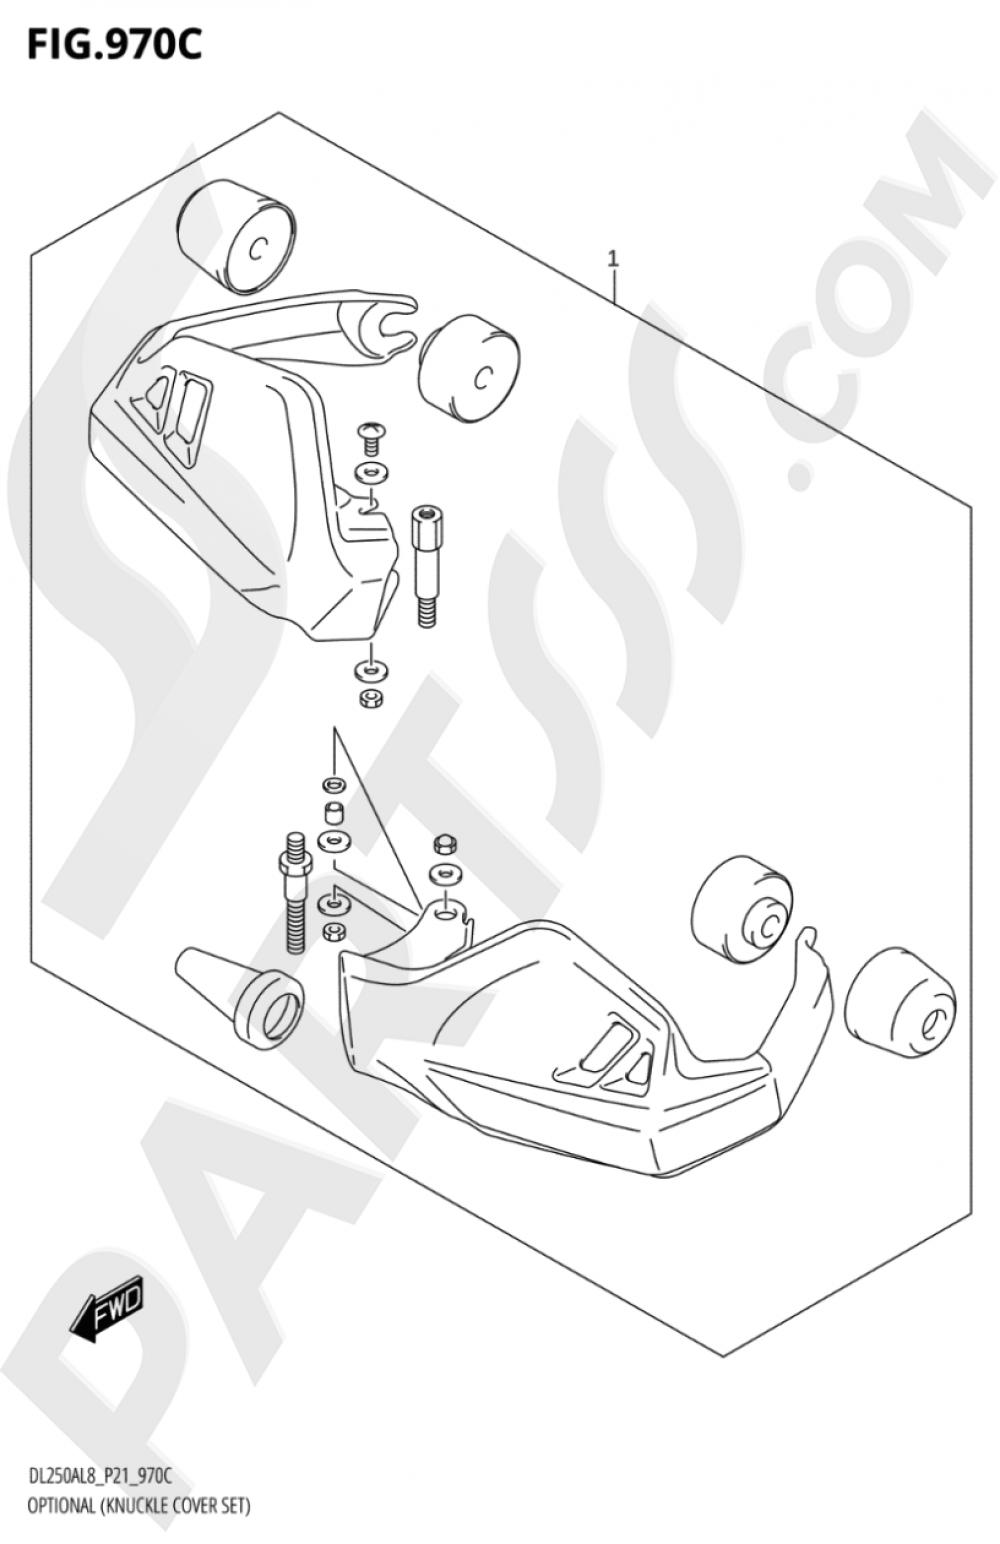 970C - OPTIONAL (KNUCKLE COVER SET) Suzuki VSTROM DL250A 2018